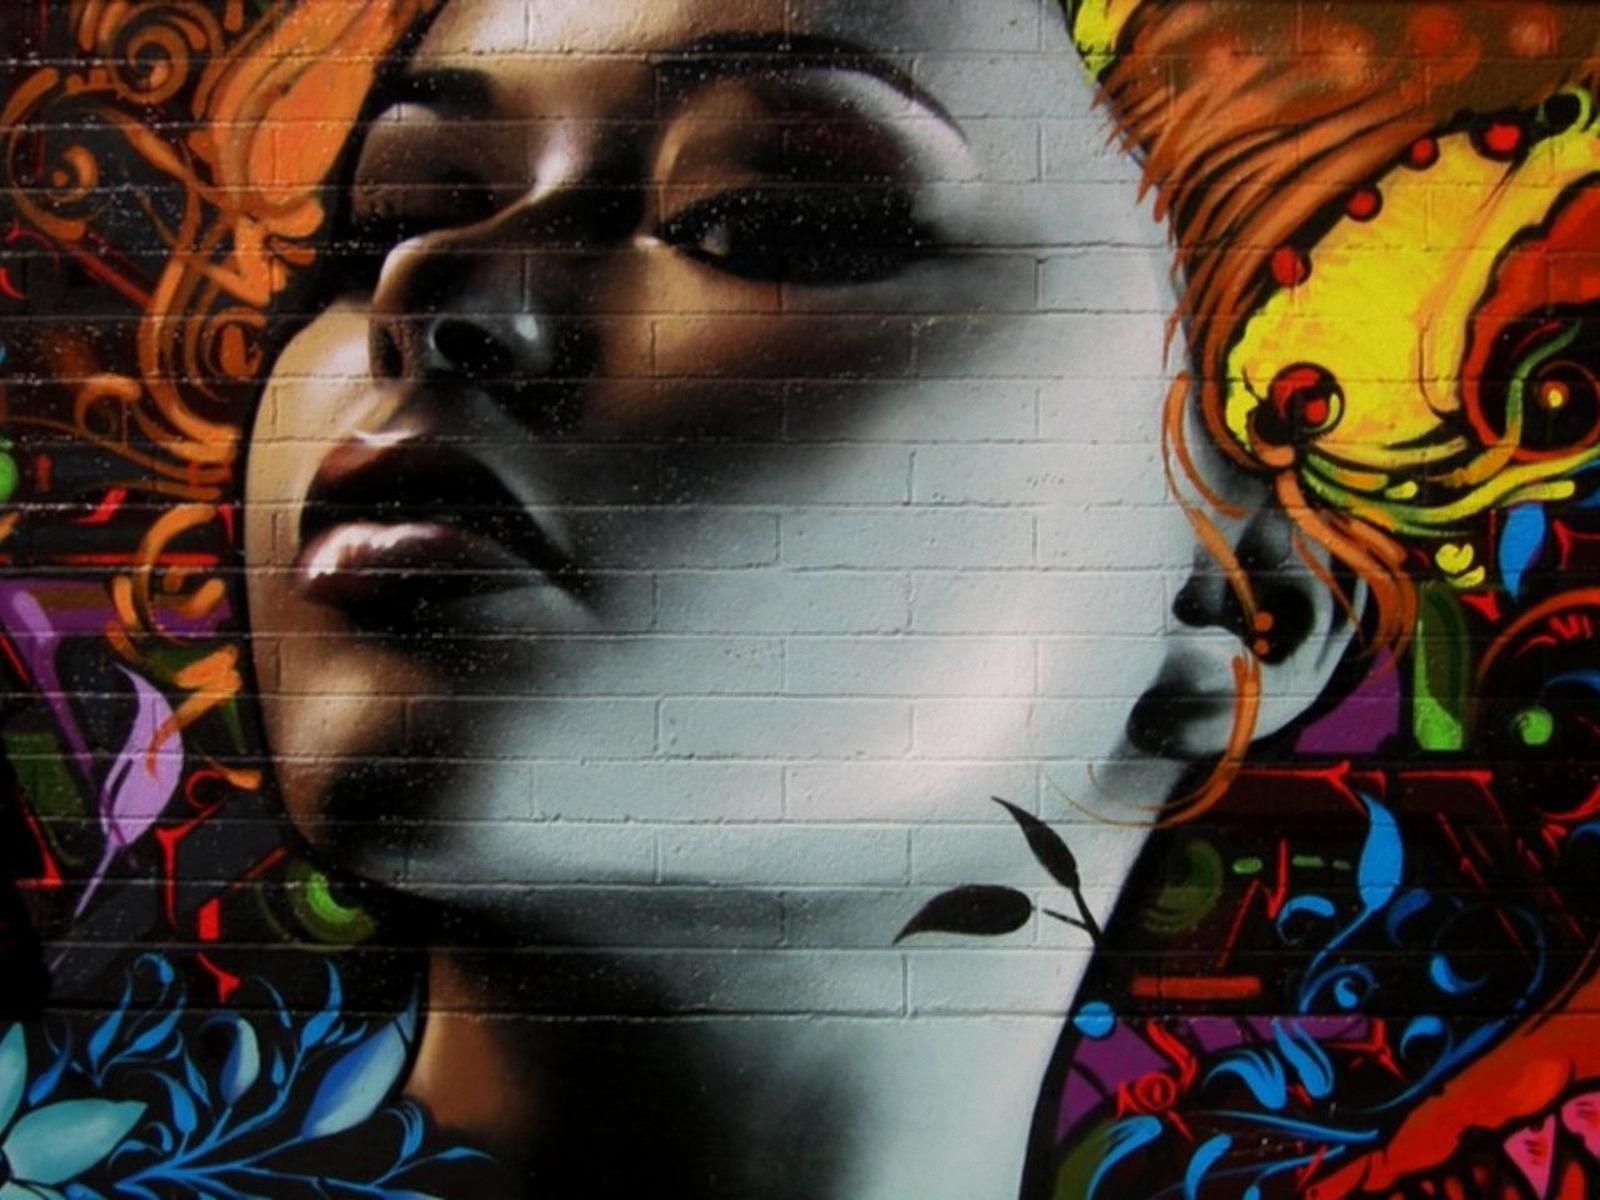 Graffiti Girl Wallpapers 1600x1200 376133